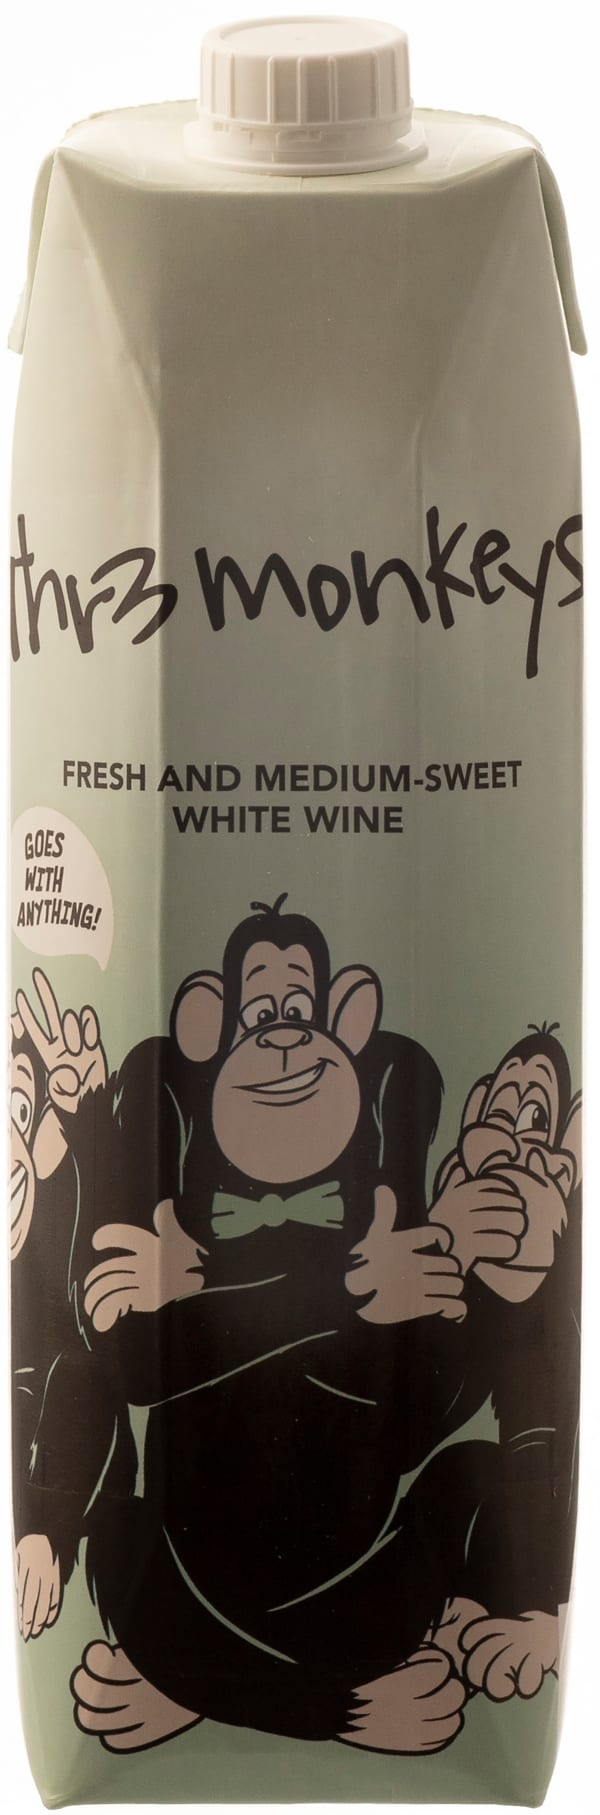 Thr3 Monkeys 2017 carton package